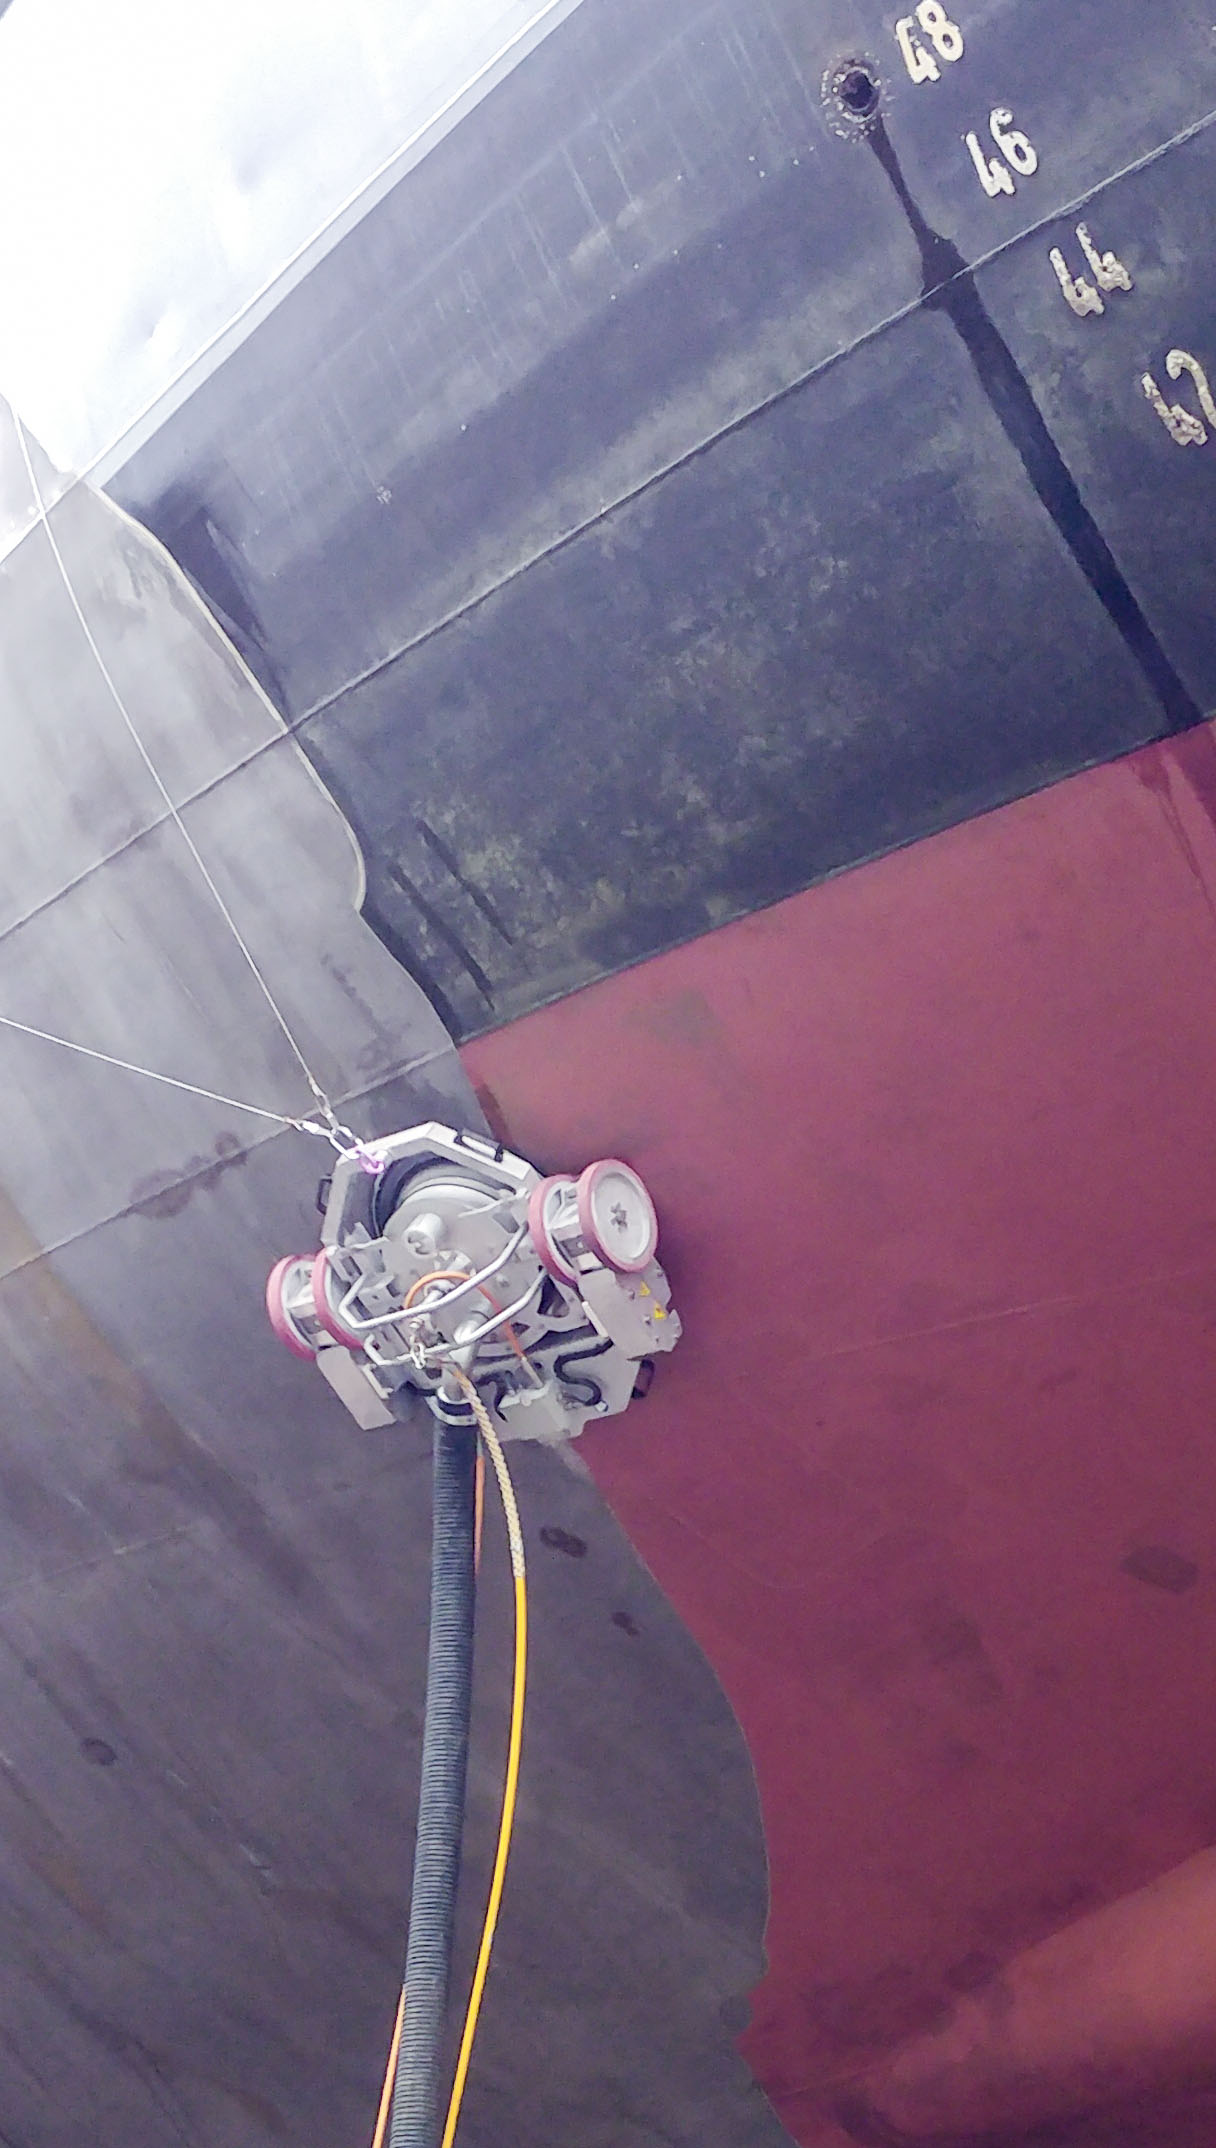 Spiderjet-03.jpg